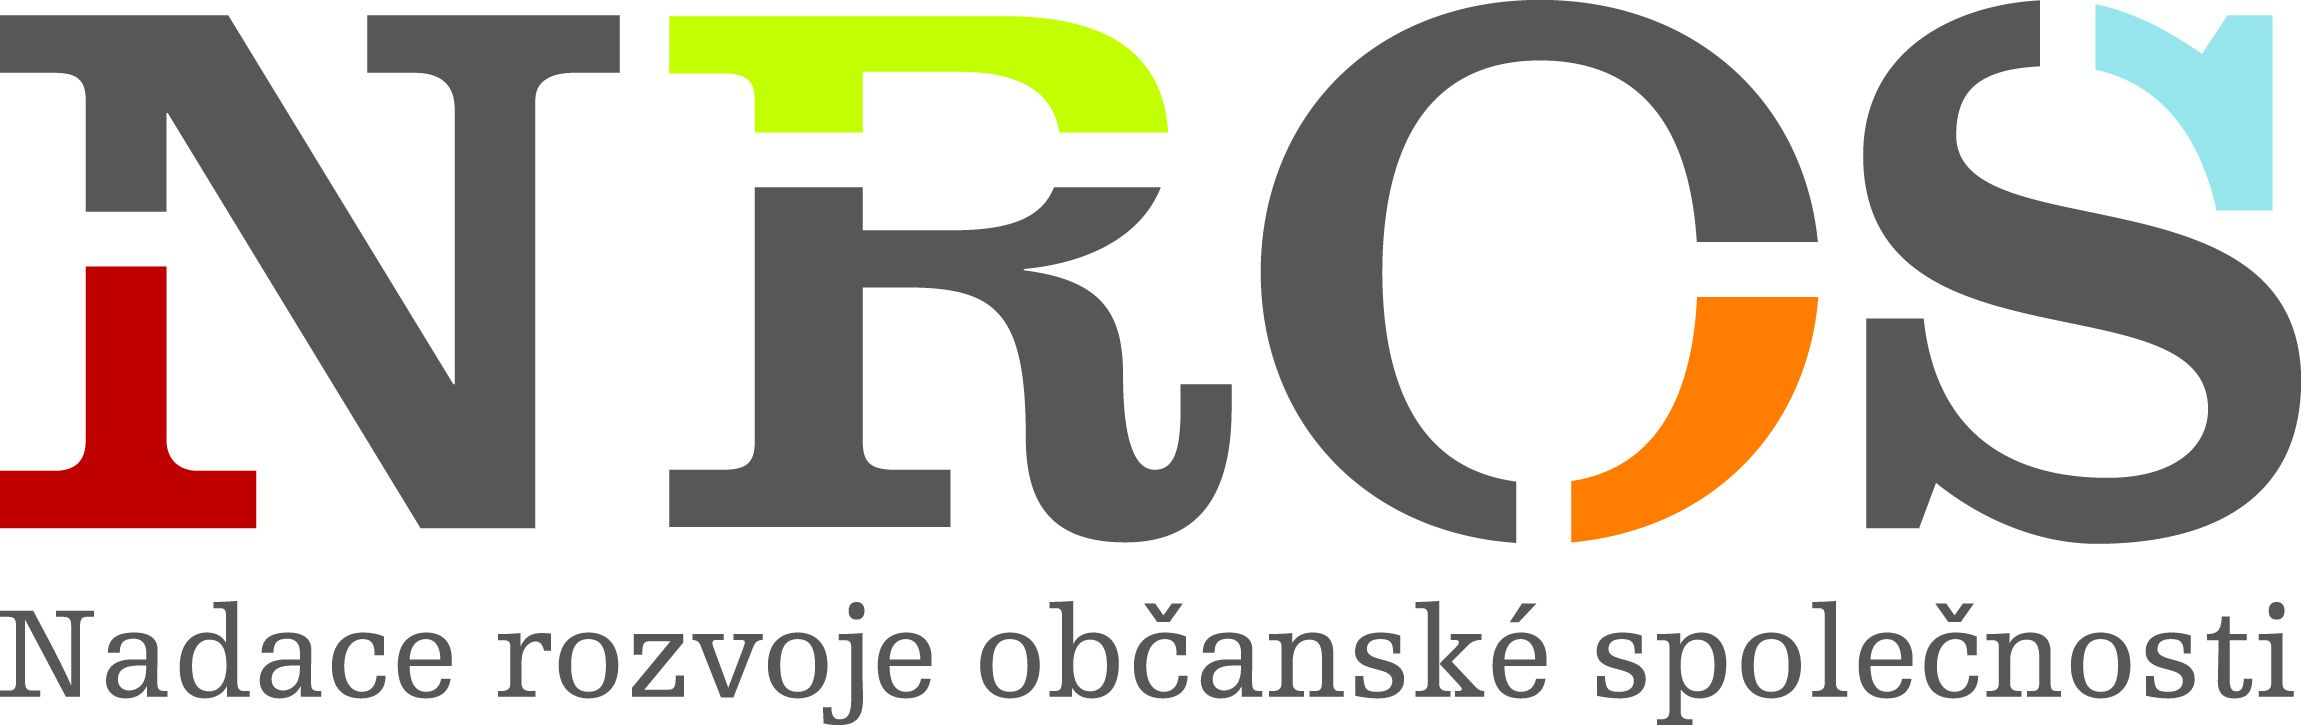 NROS logo